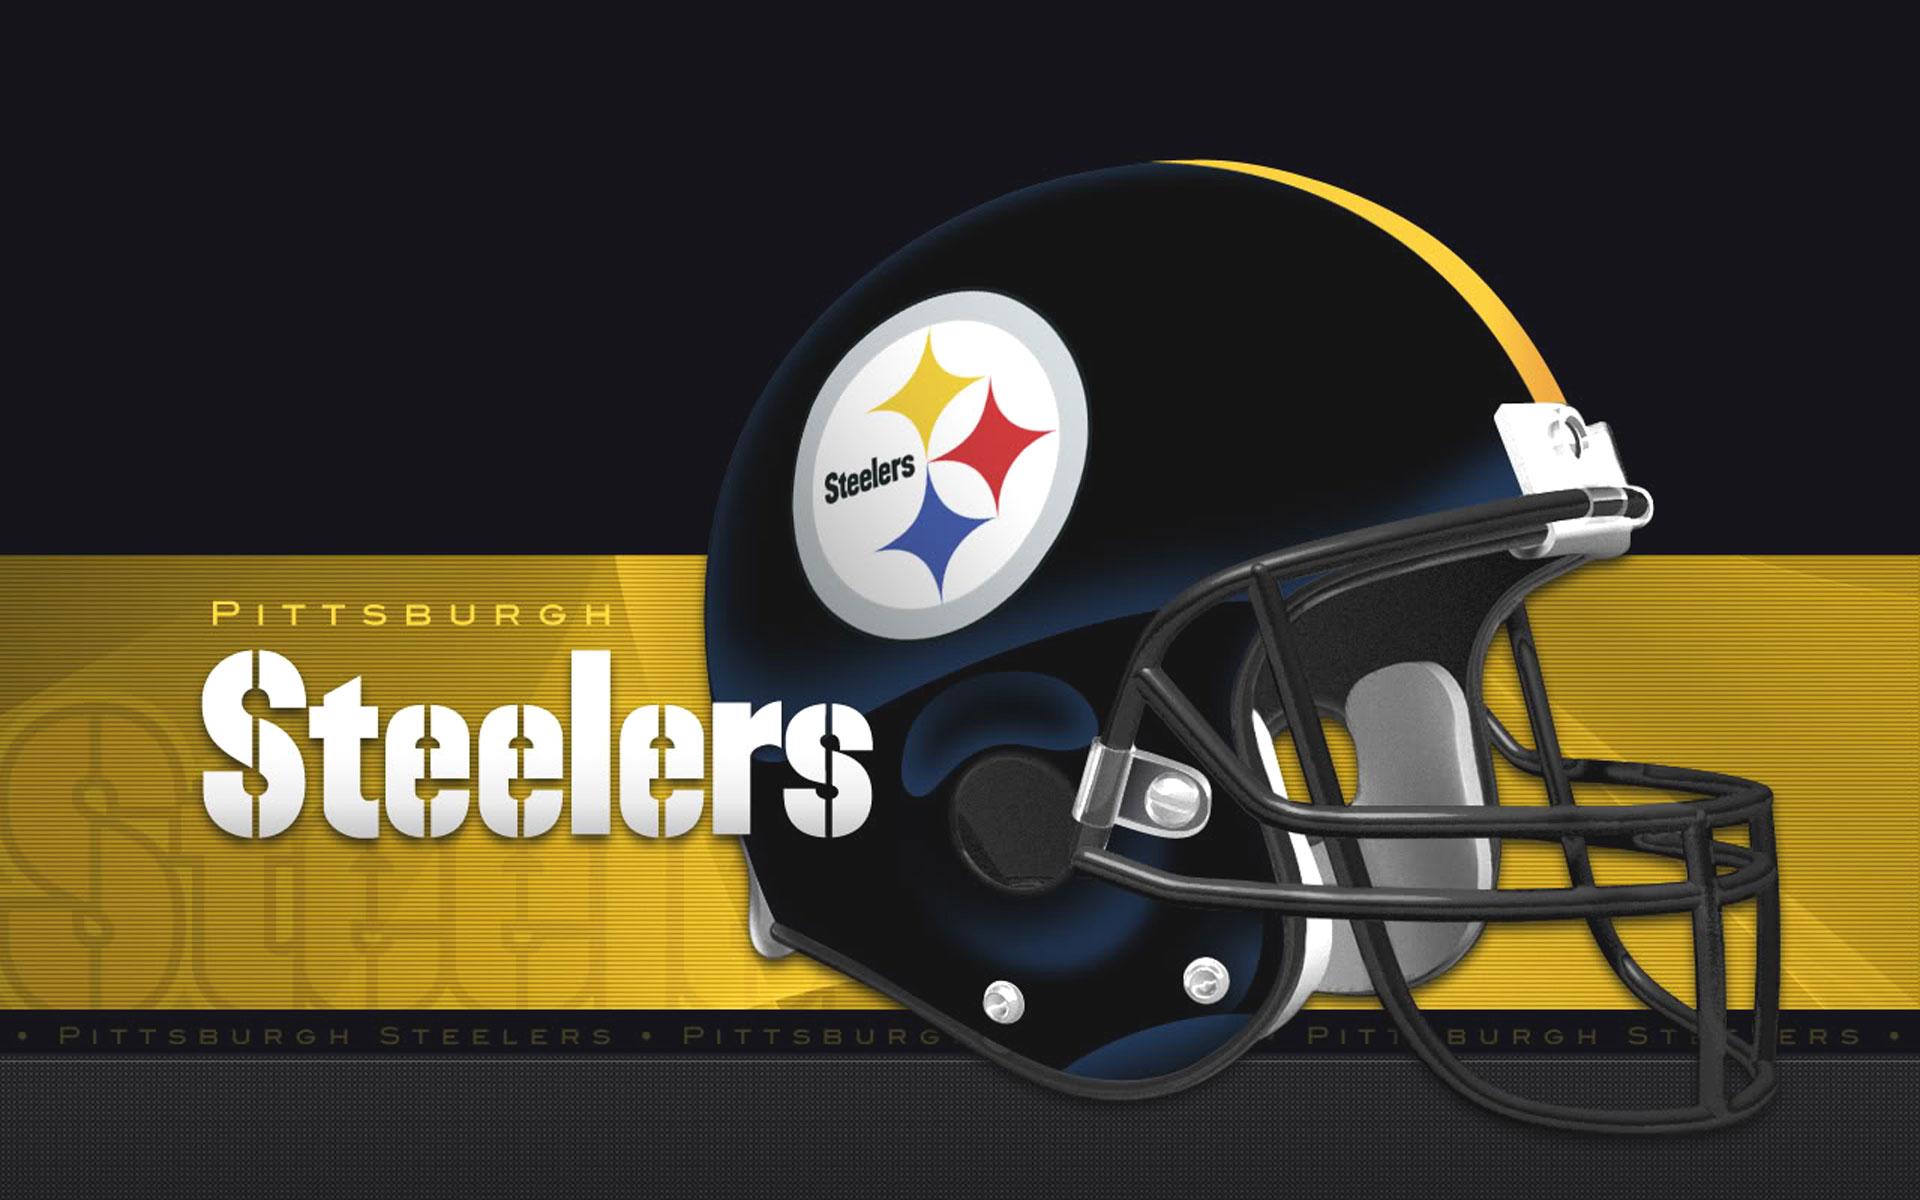 Pittsburgh Steelers wallpaper Fondos de pantalla de Pittsburgh 1920x1200